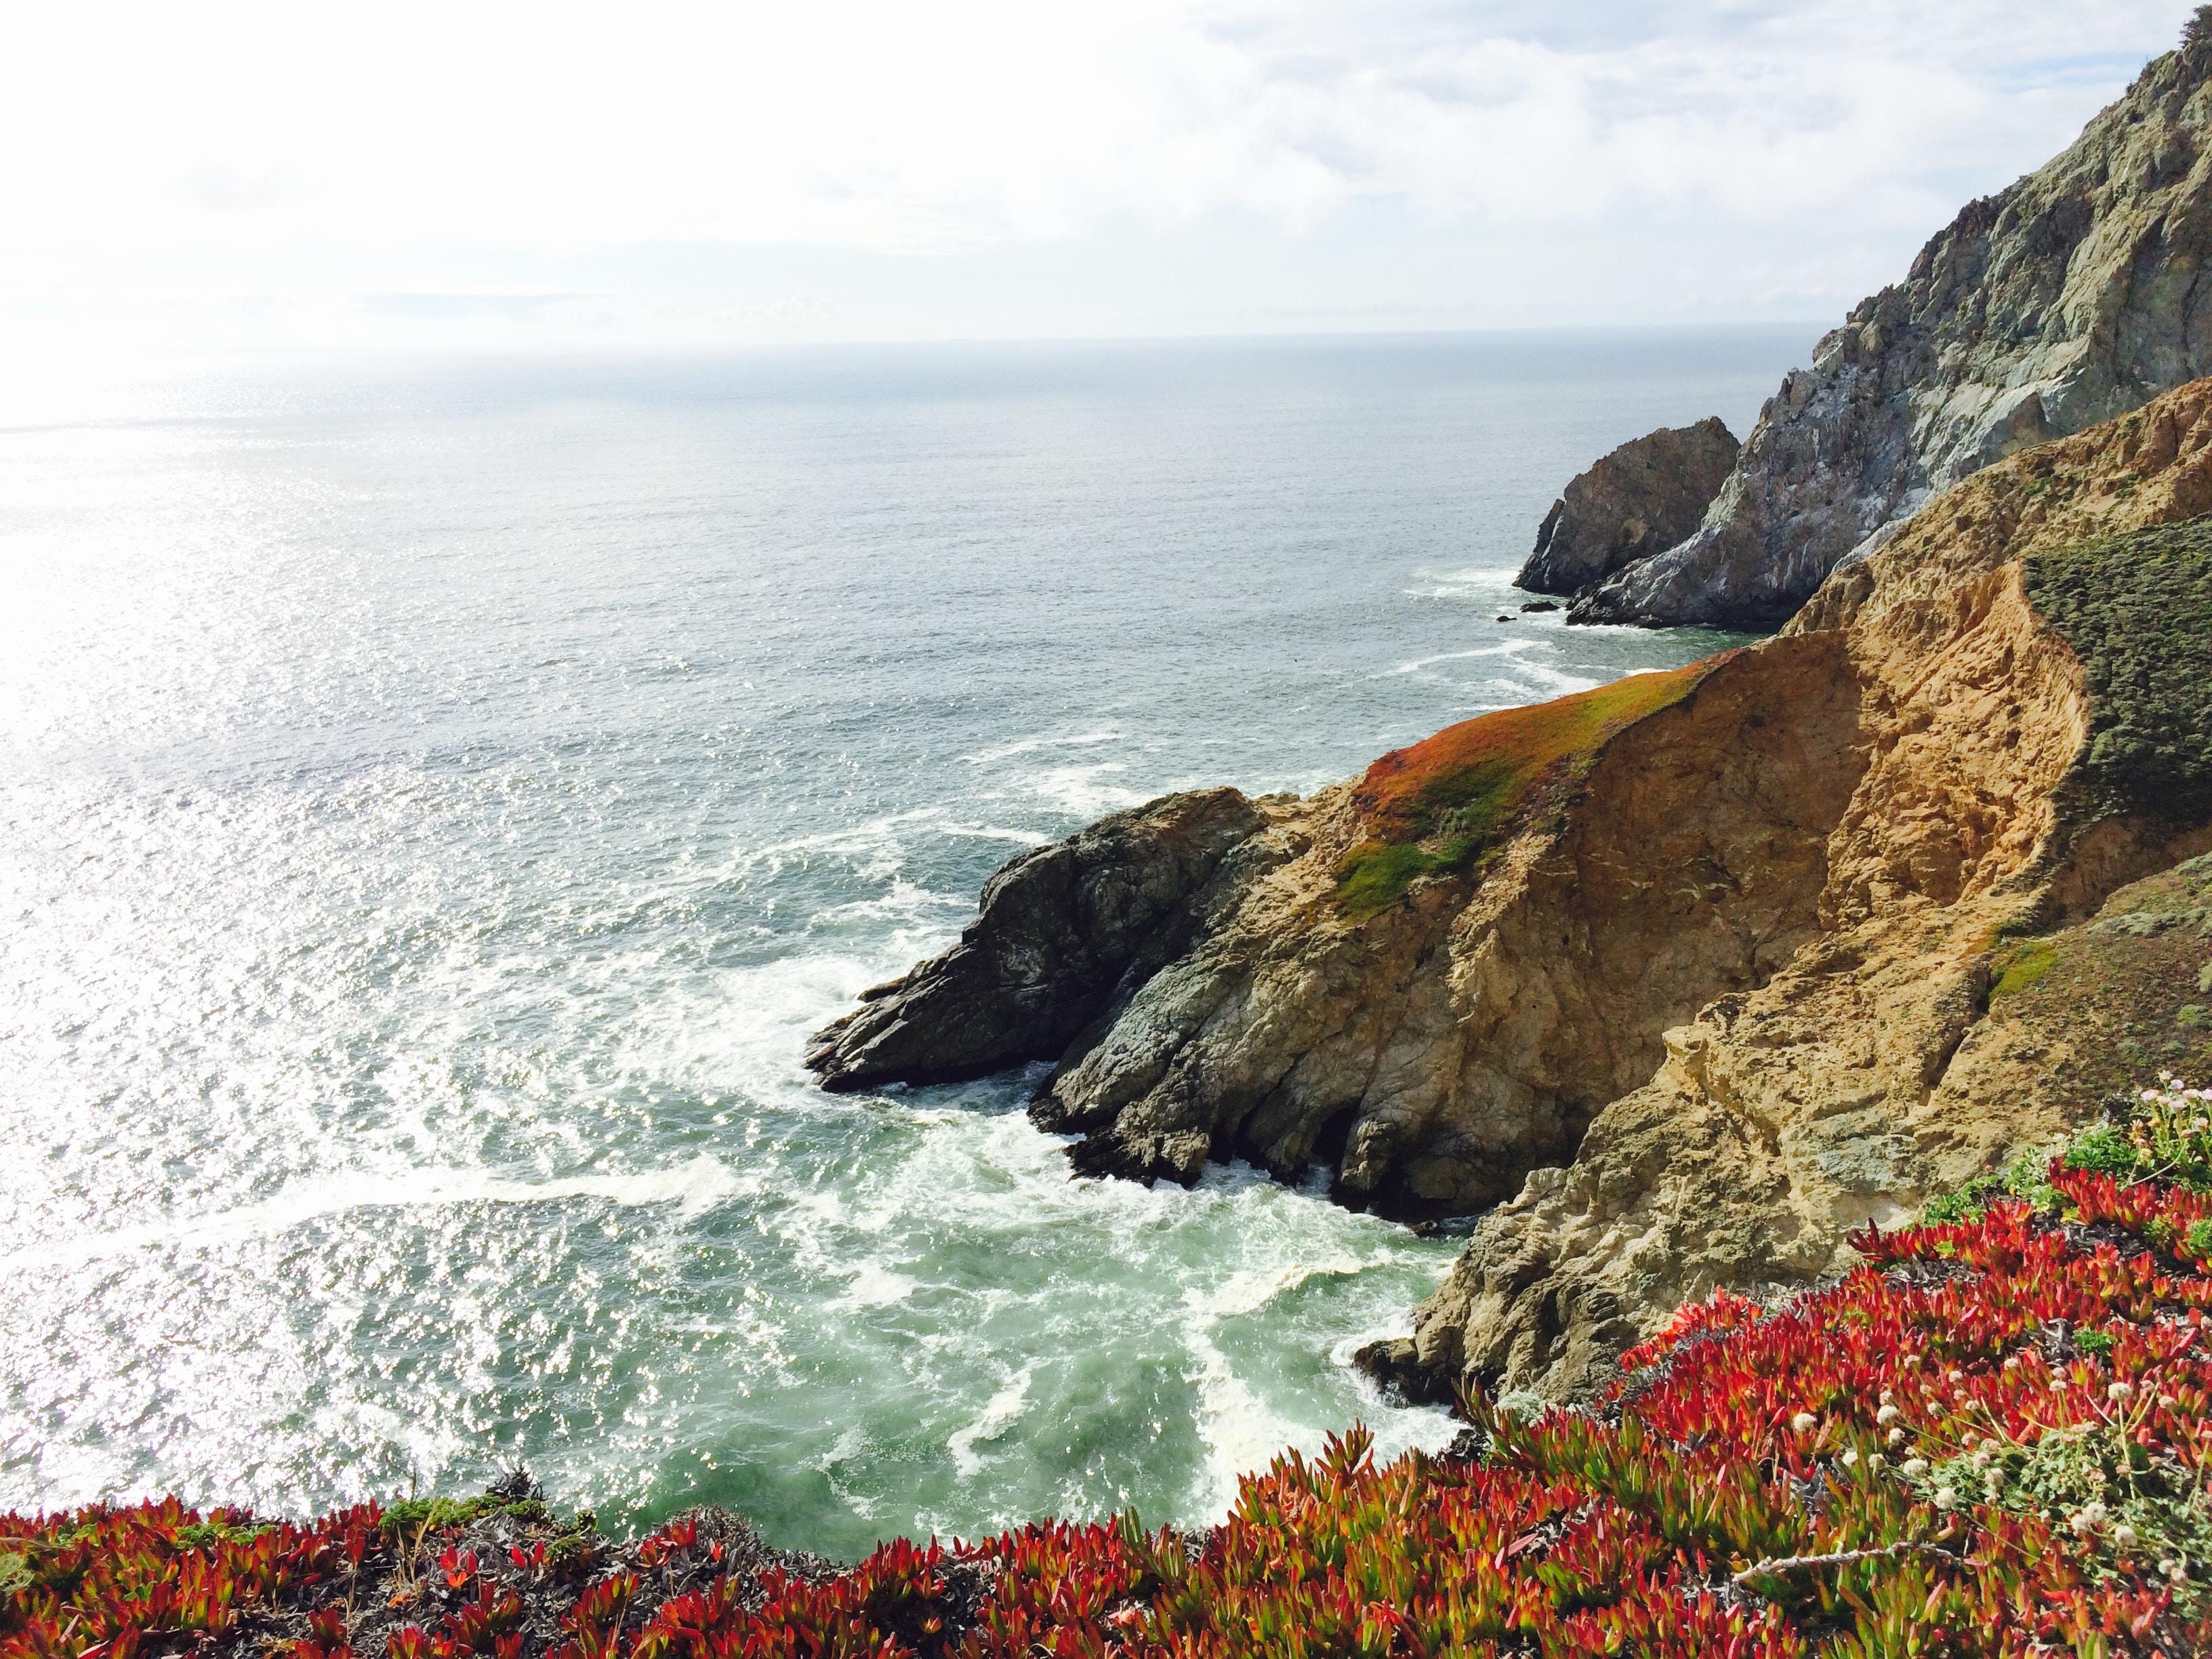 Cliff edge with flowers overlooking rocky ocean coastline at Devil's Slide